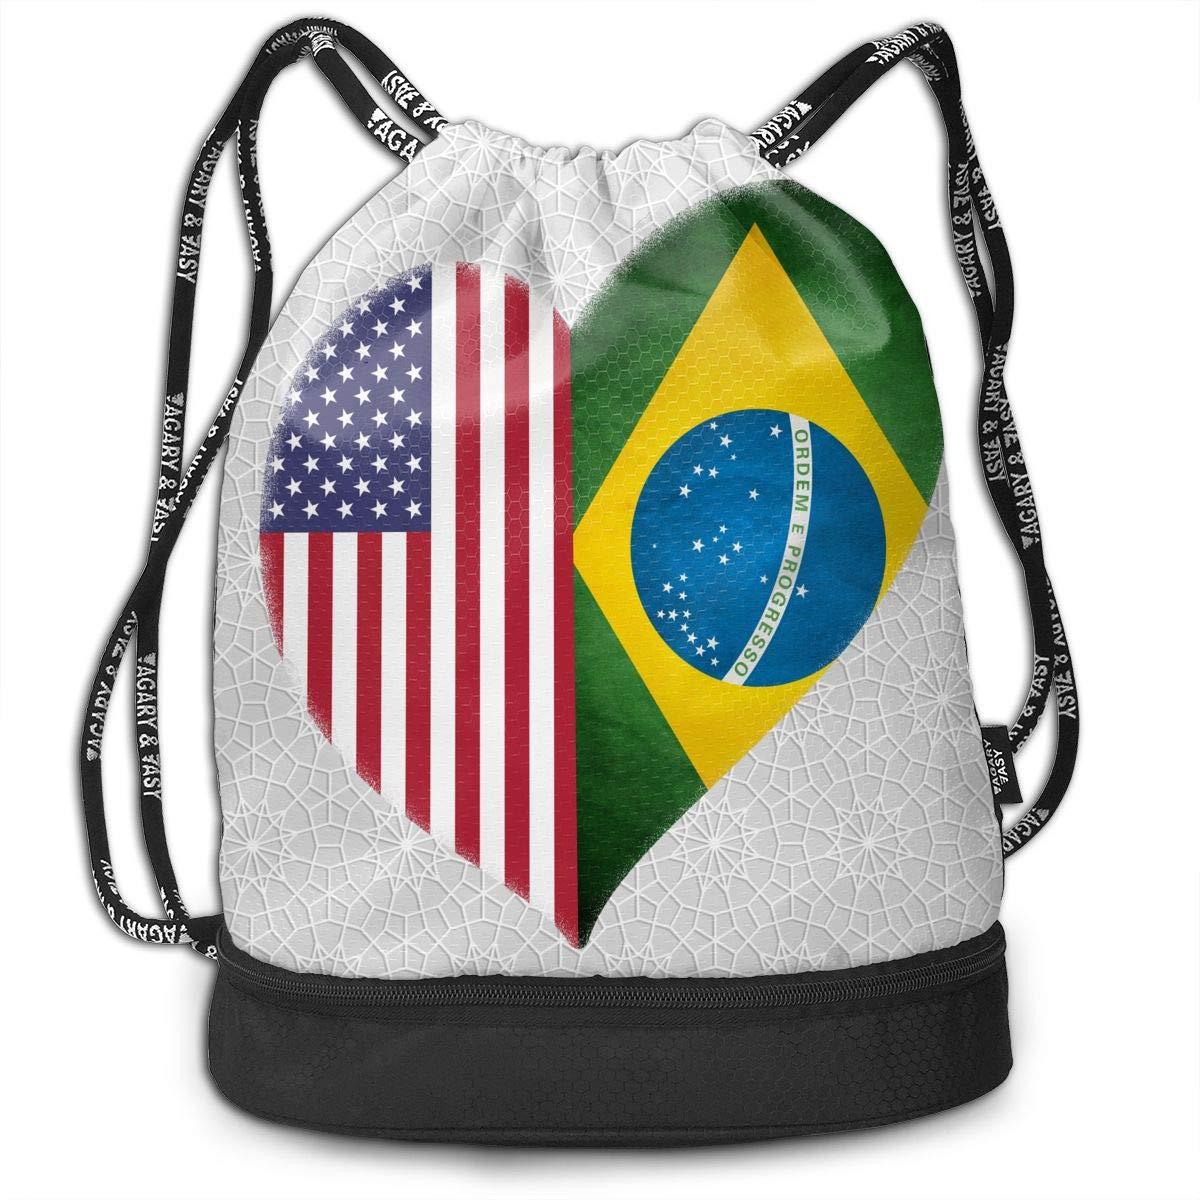 Heart Brazil American Flag Drawstring Bag Multifunctional String Backpack Custom Cinch Backpack Sport Gym Sack